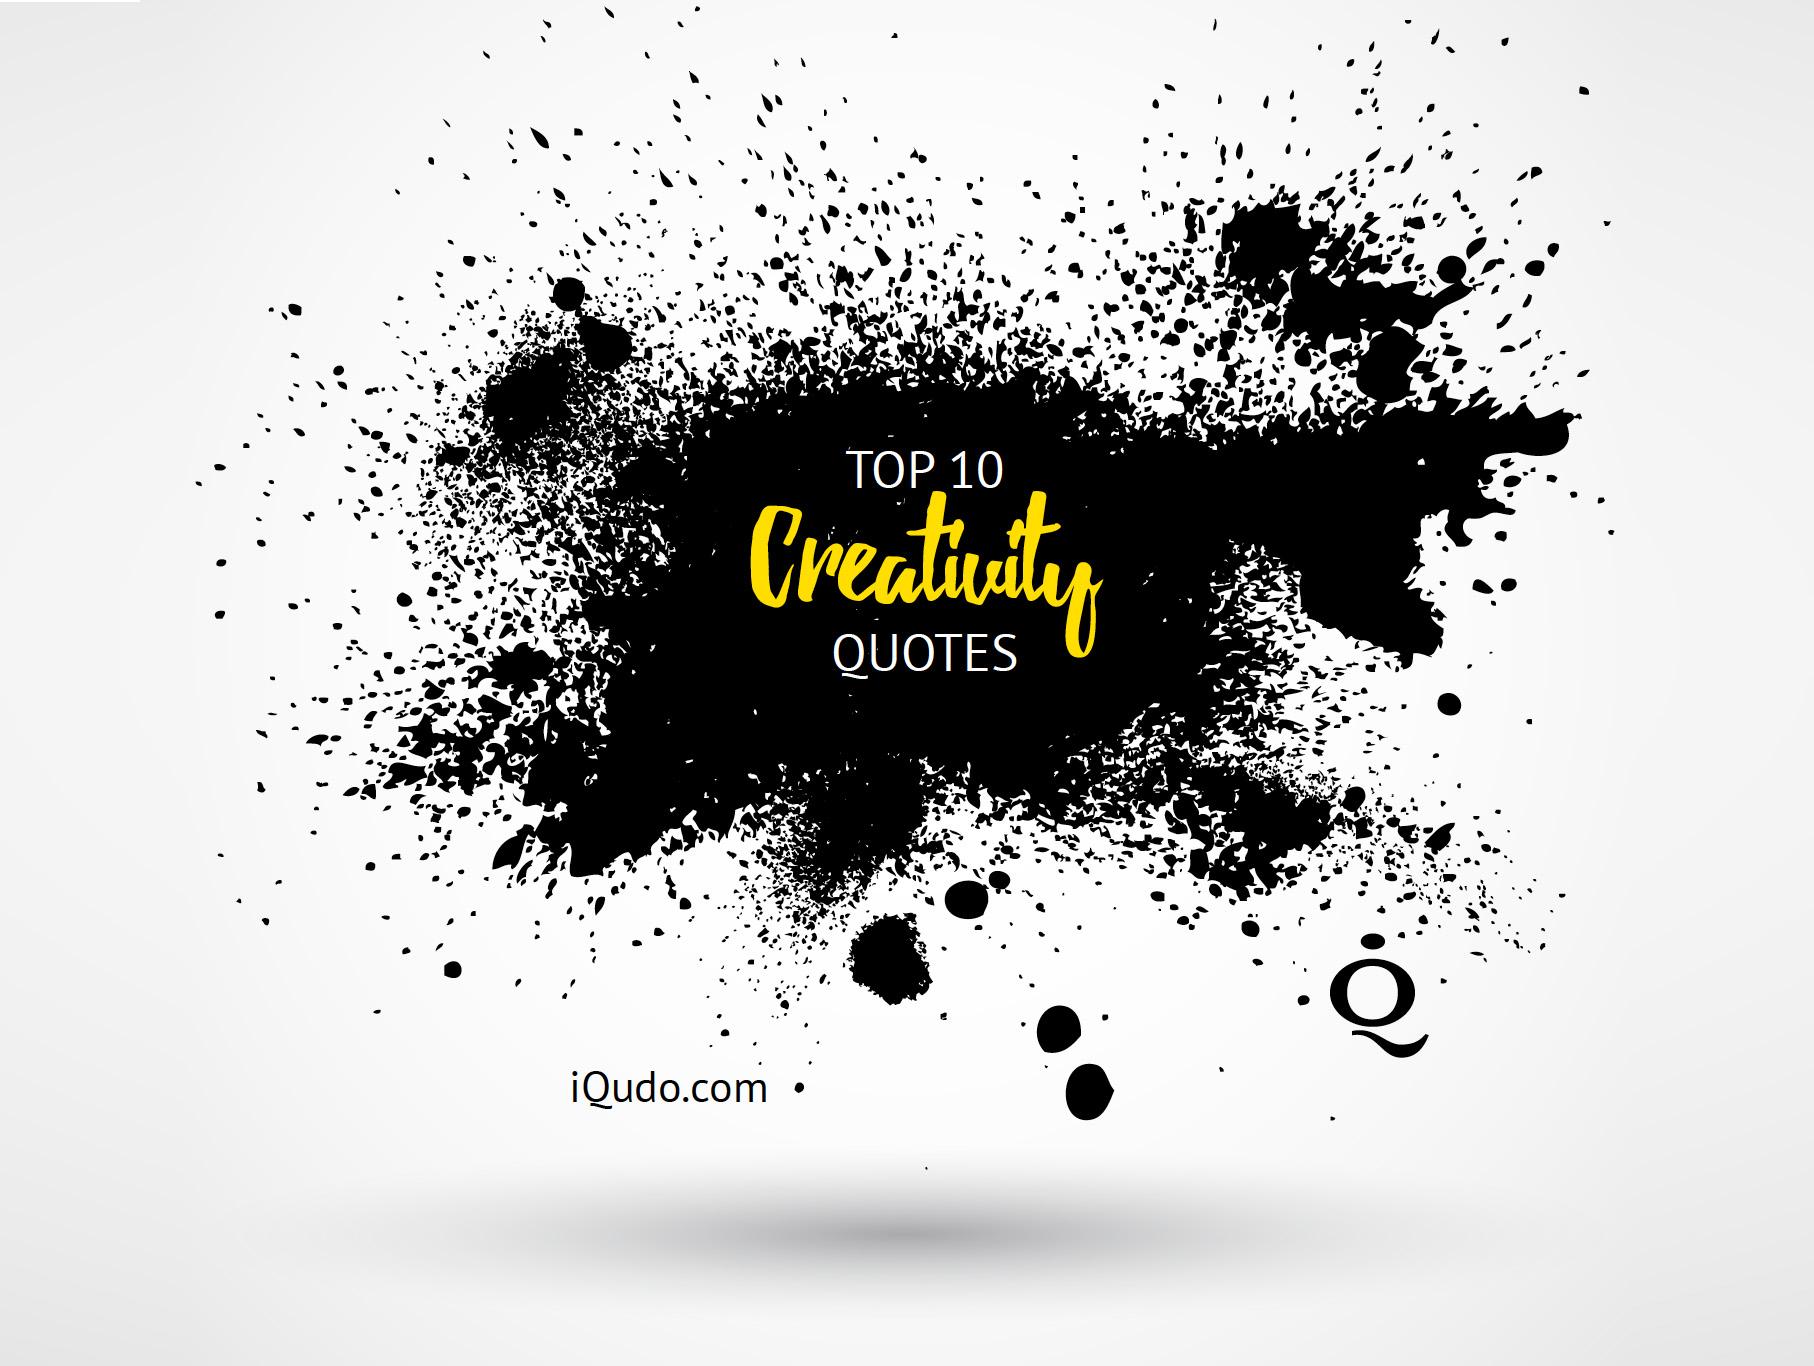 Top_Ten_Creativity_Quotes